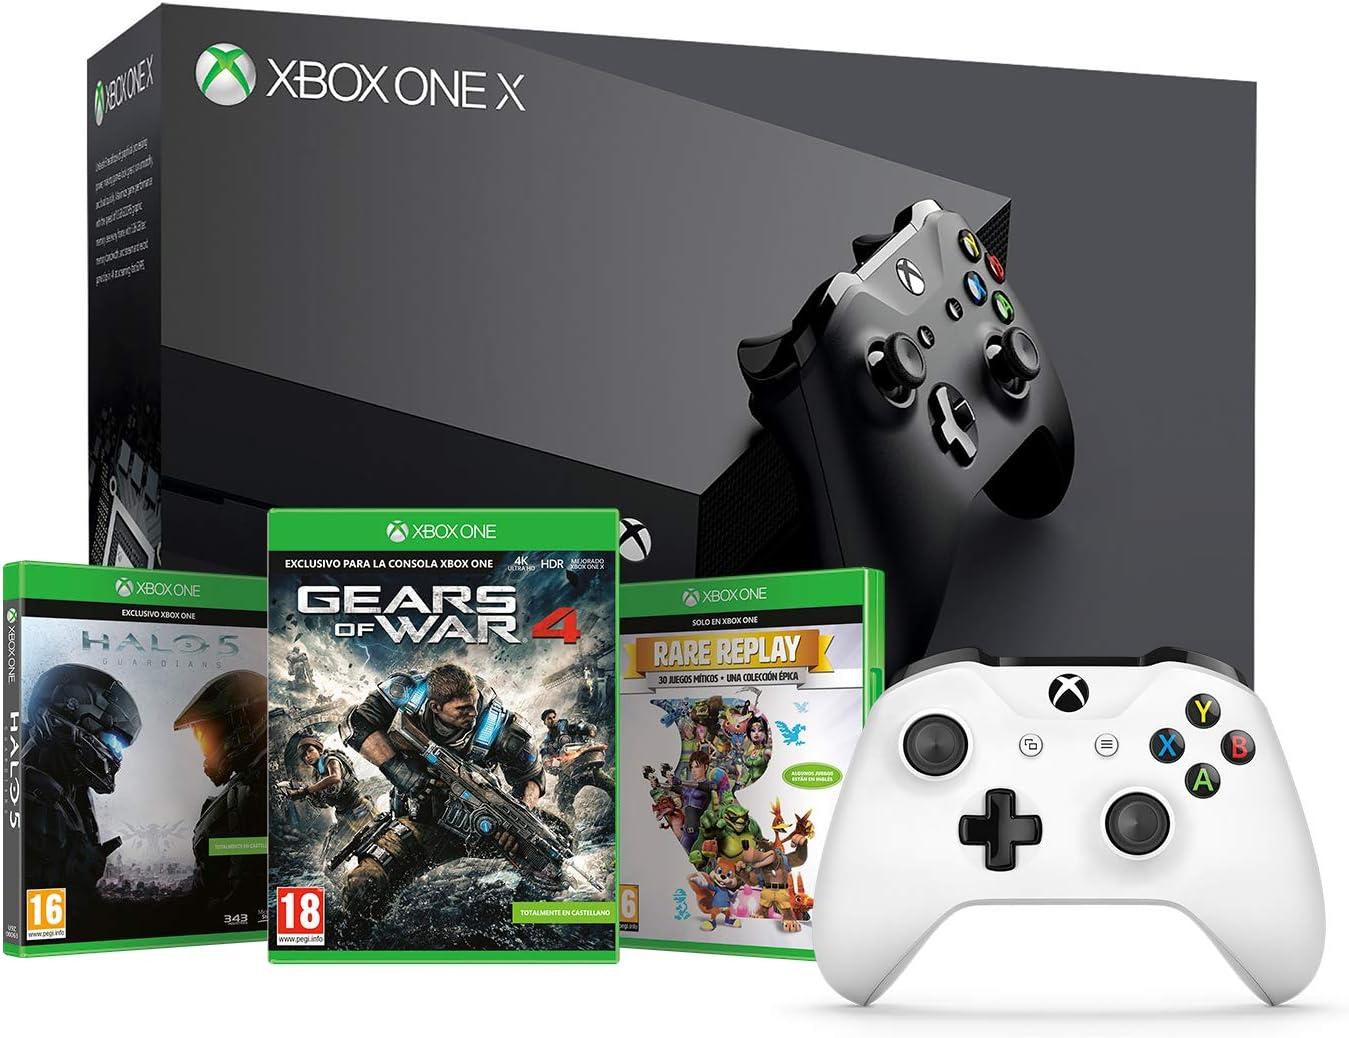 Microsoft Xbox One X - Consola 1 TB 4K HDR Negro + Microsoft - Xbox Wireless Controller Gamepad, Blanco (PC, Xbox One S): Amazon.es: Videojuegos